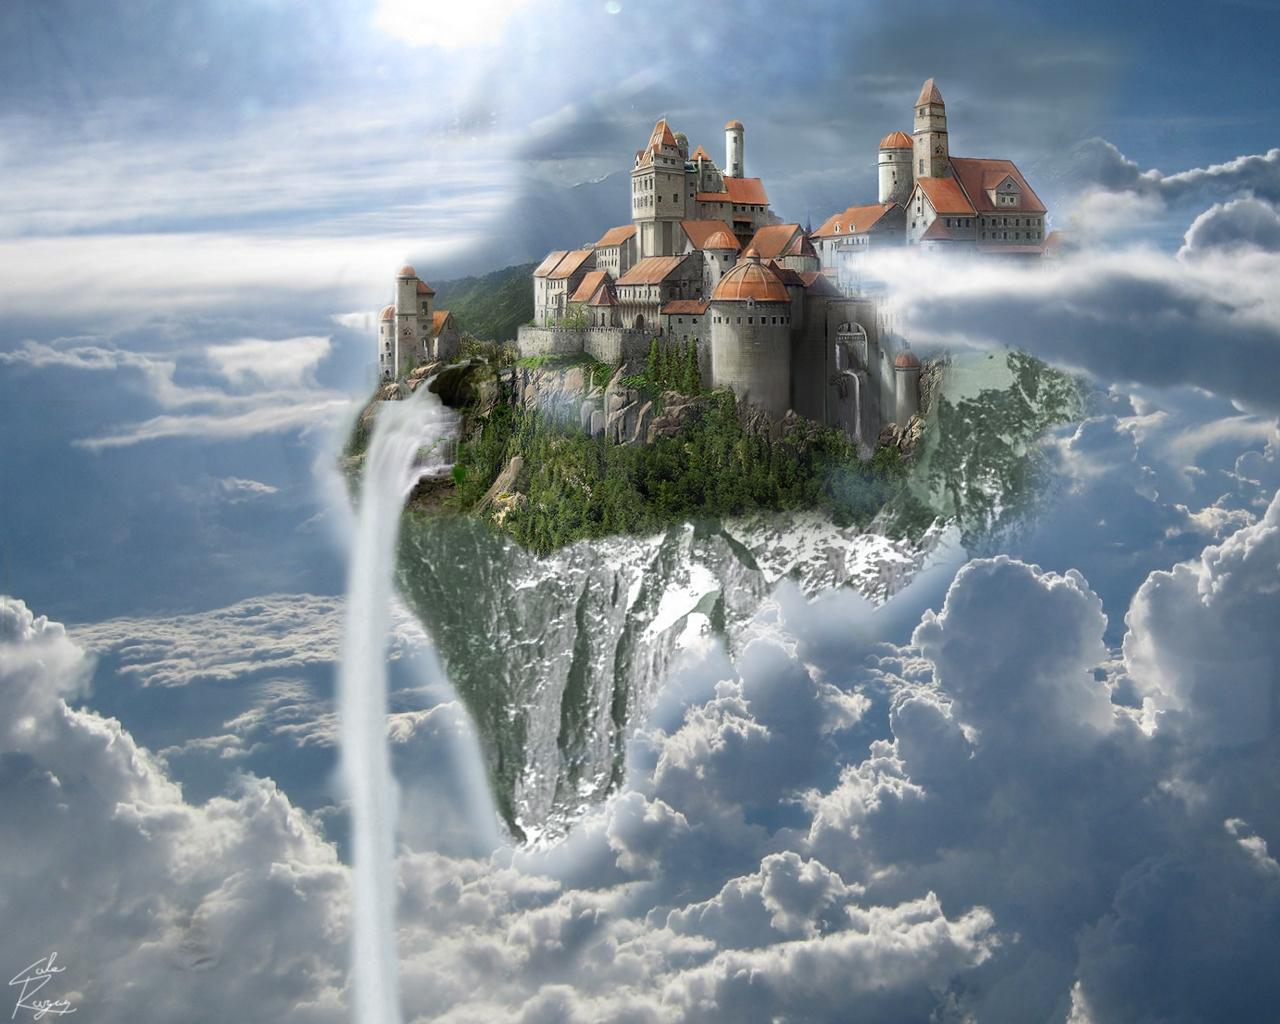 'Floating Castle' by AnAngryScottsman (deviantart.com)